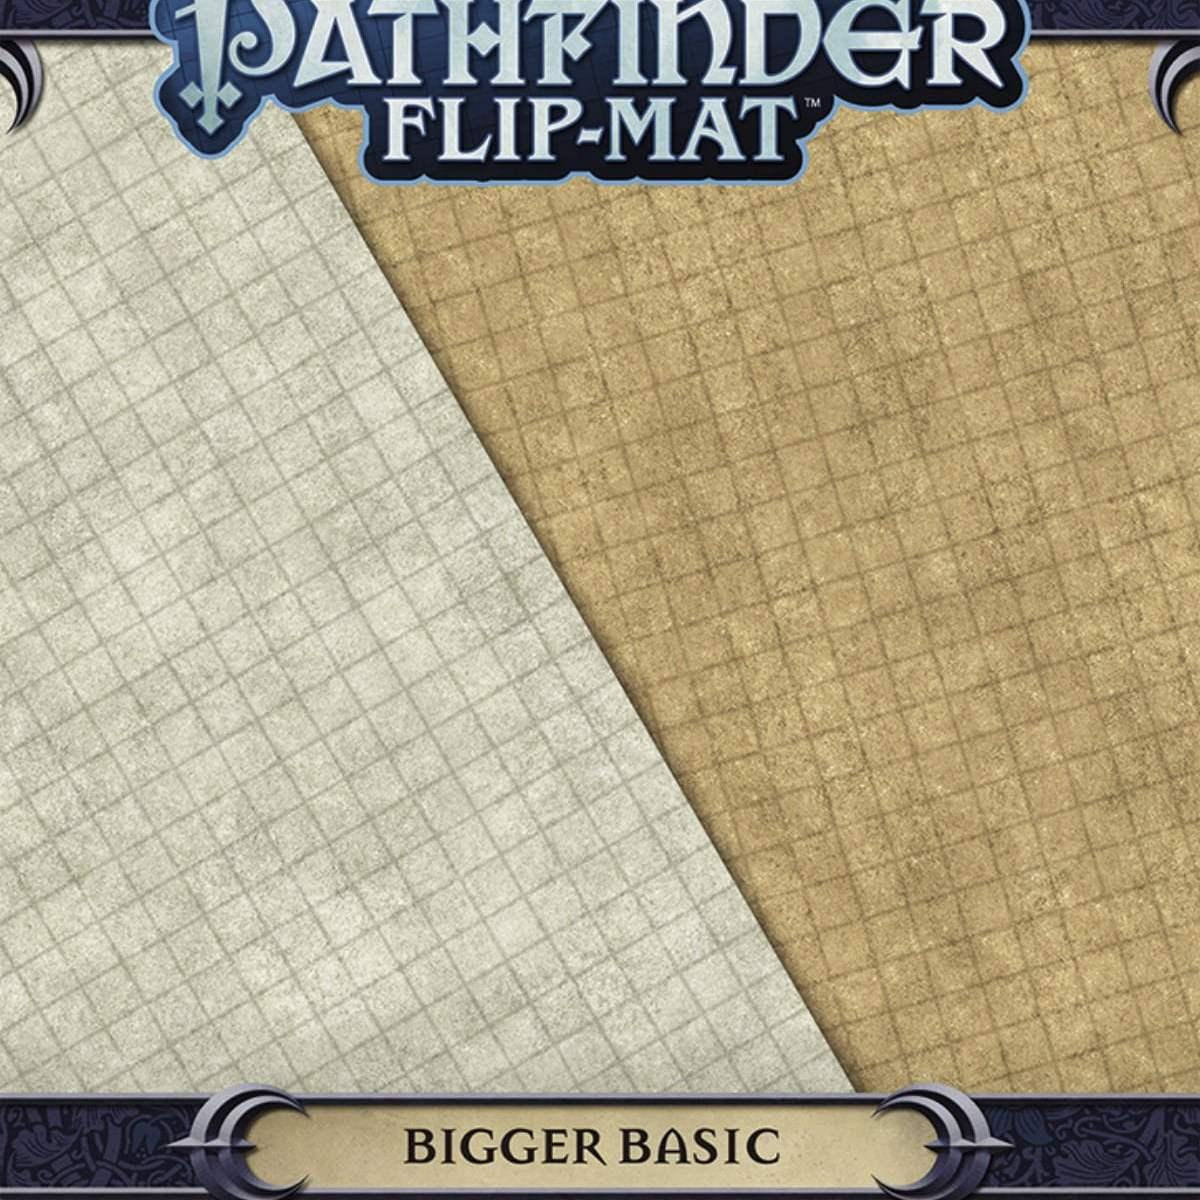 Pathfinder Bigger Battle Mats